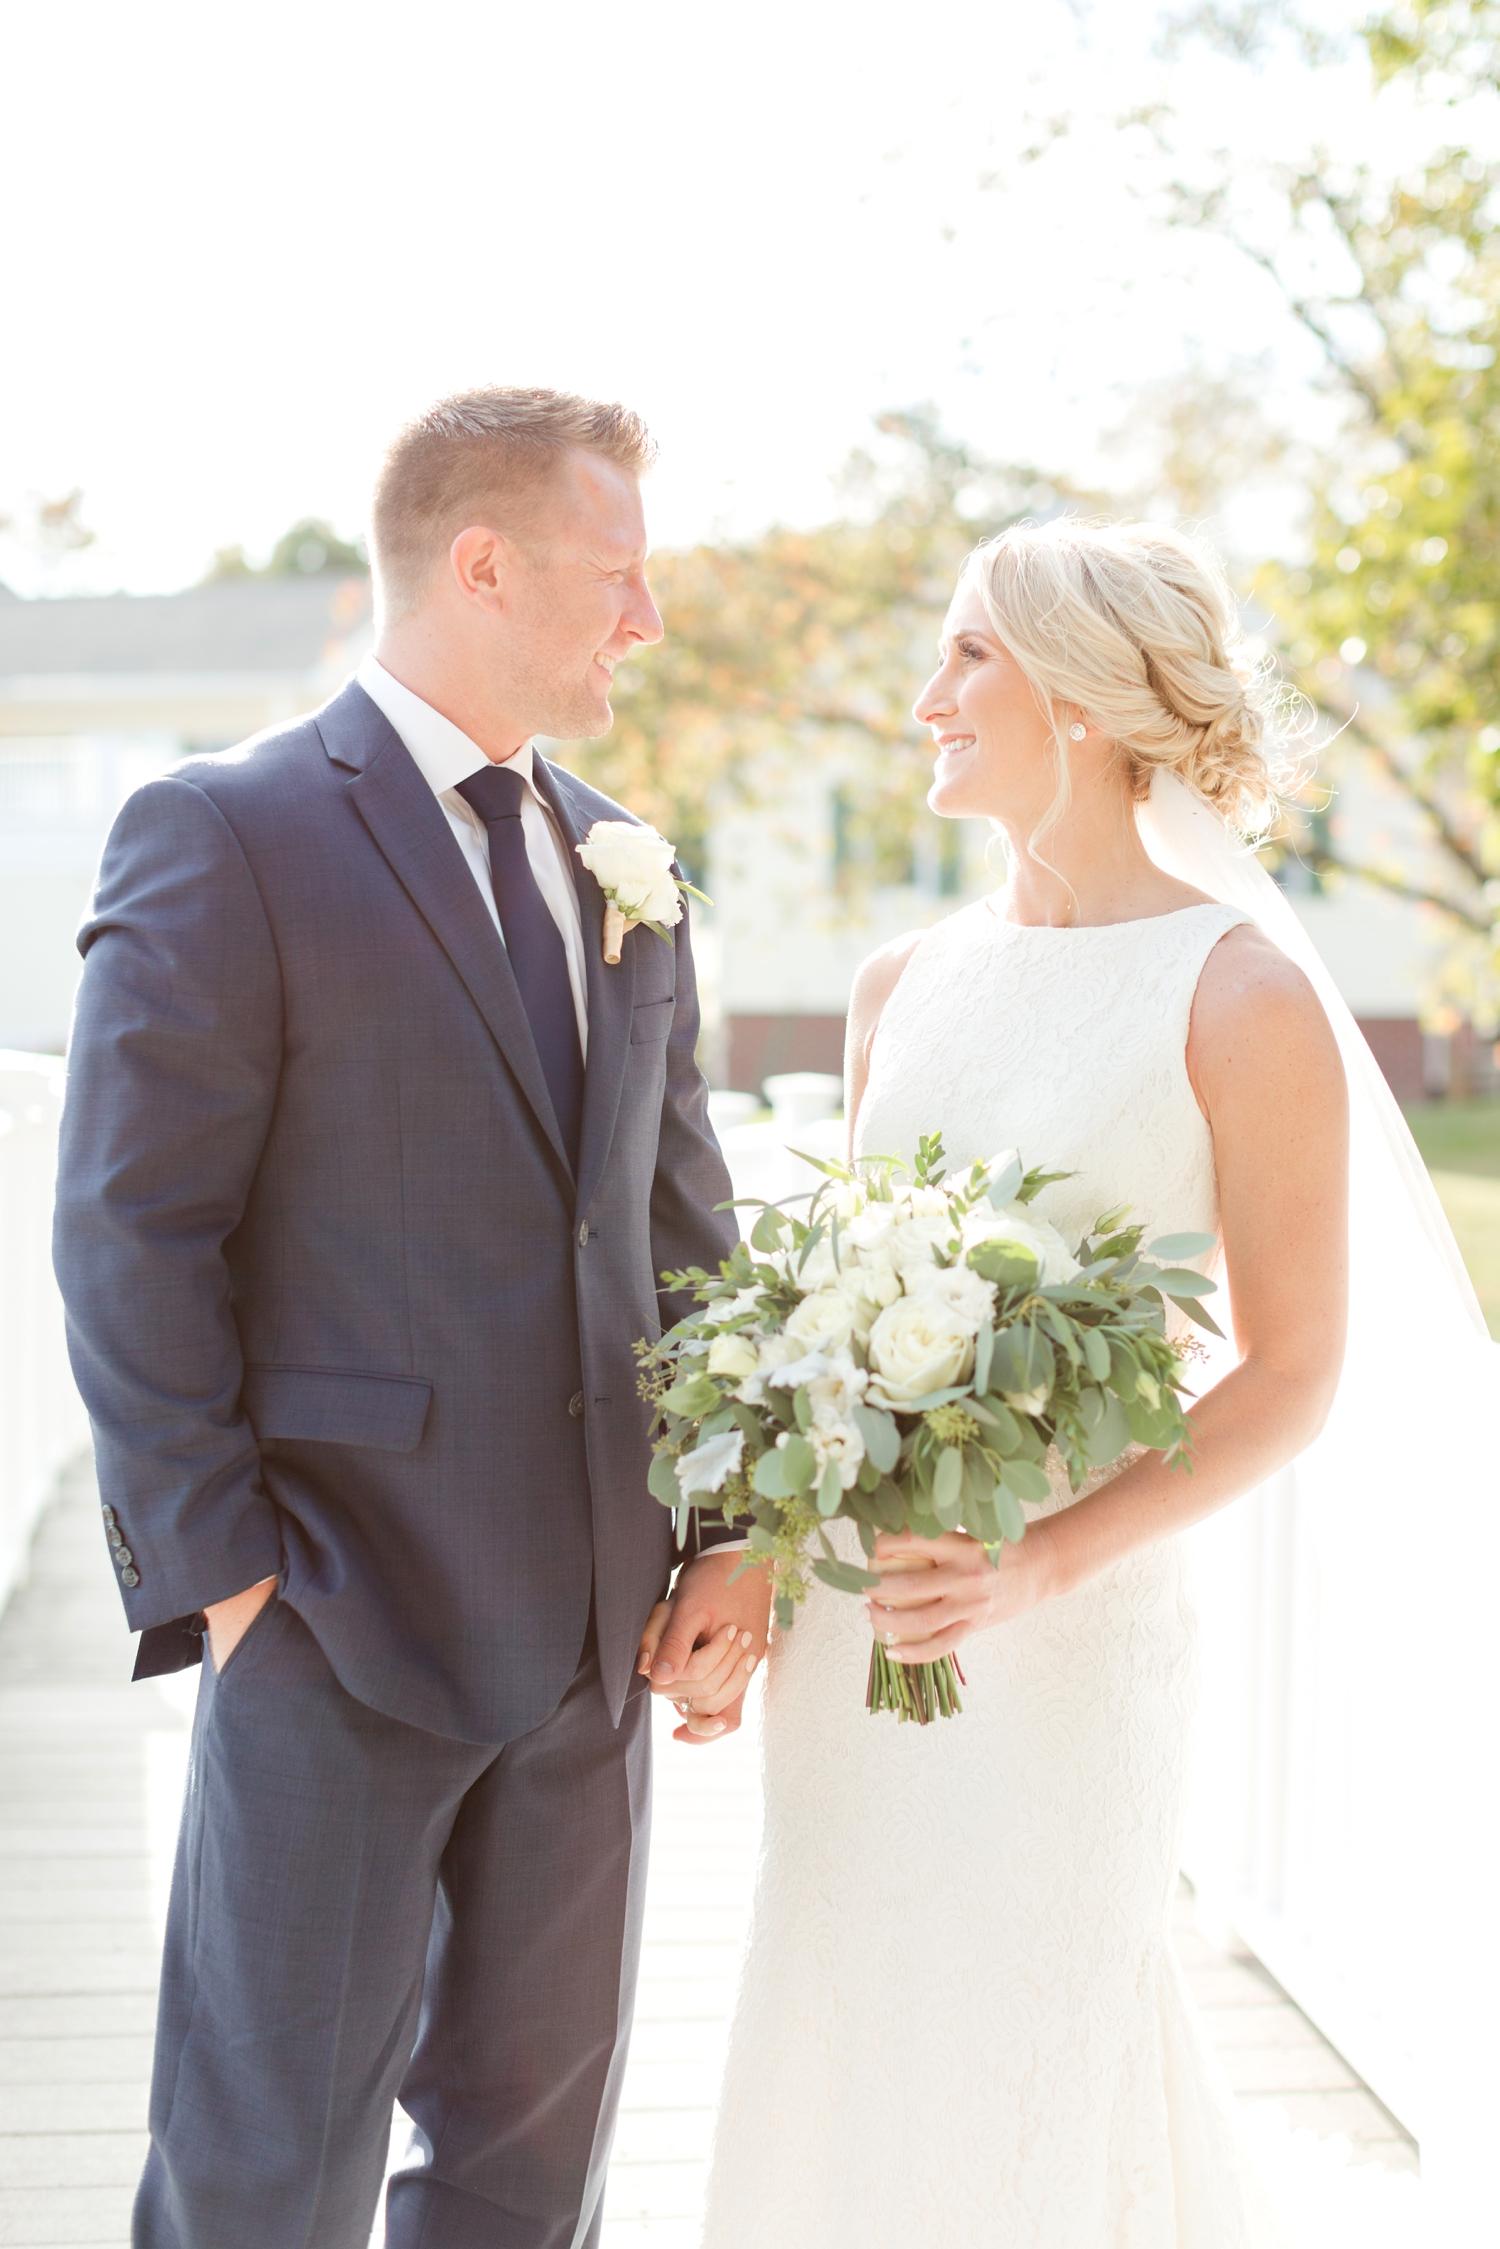 Wojciechowski Wedding-326_the-oaks-waterfront-inn-wedding-easton-maryland-wedding-photography-anna-grace-photography-photo.jpg